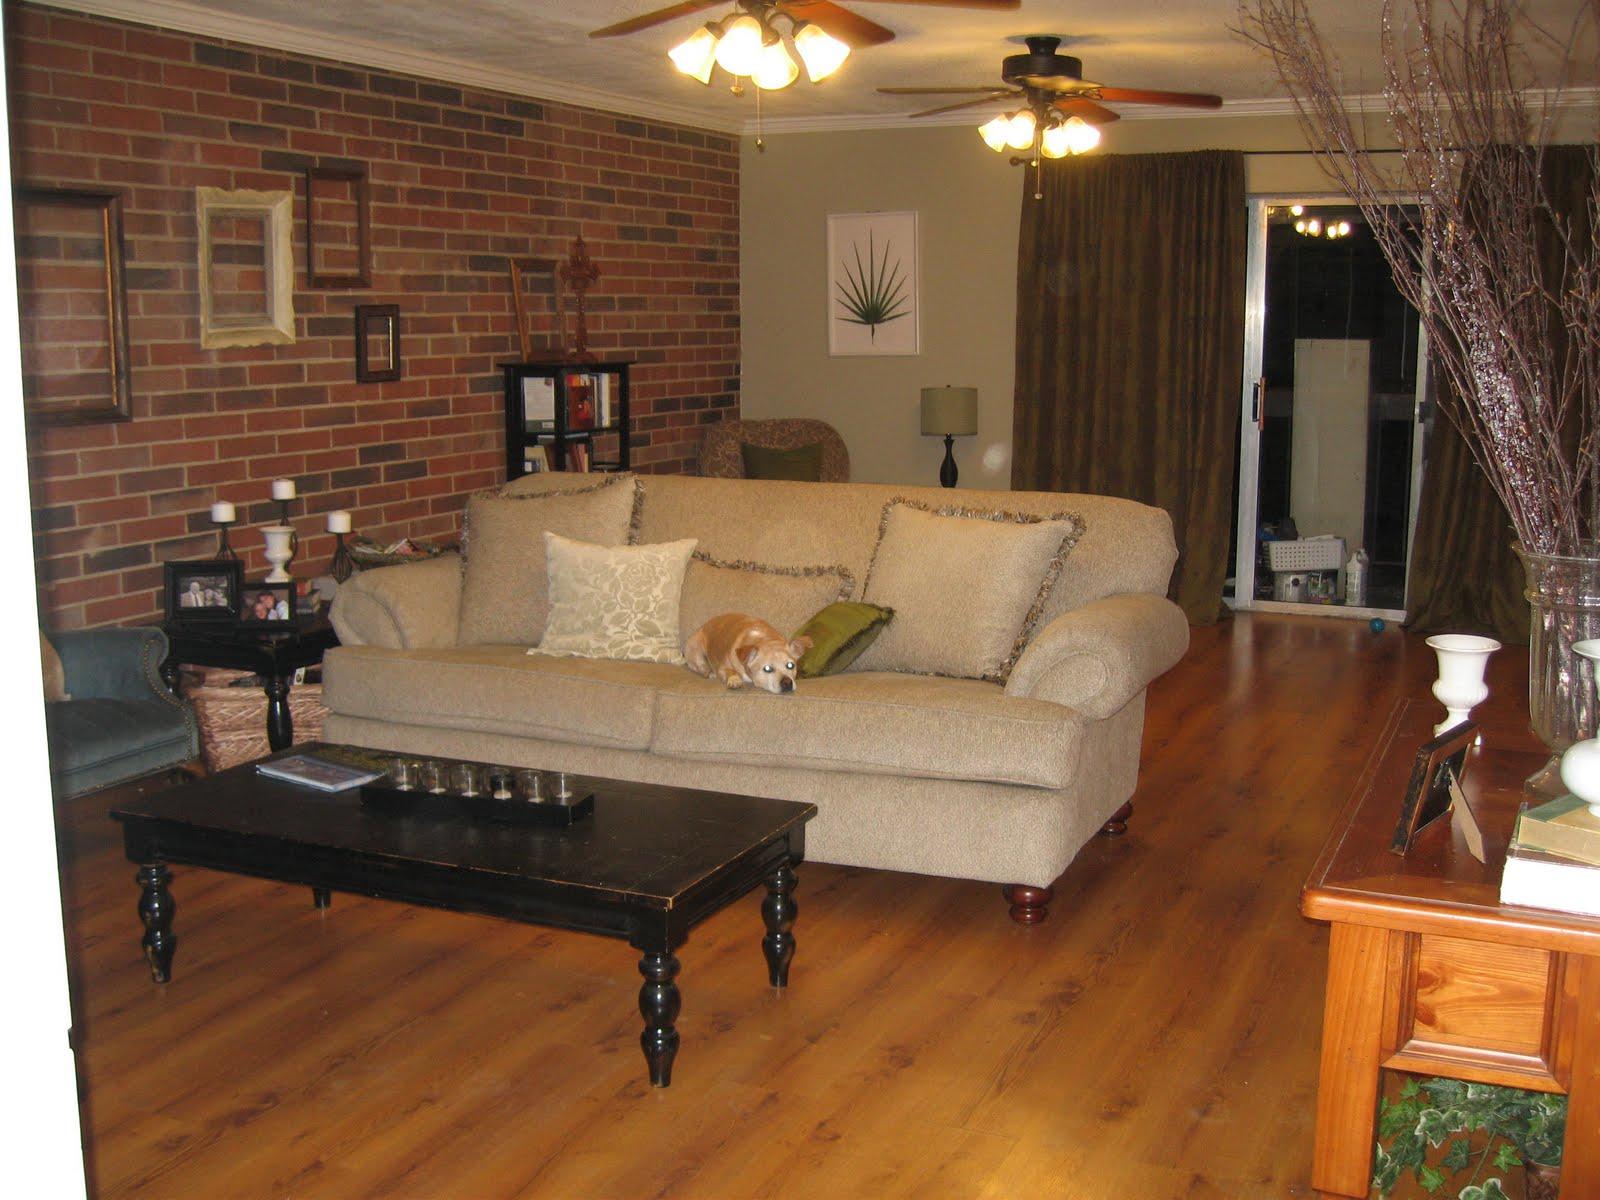 House Red Brick Wall Tiles For Living Room Design Ideas Red Brick Wallpaper Ideas 1600x1200 Download Hd Wallpaper Wallpapertip